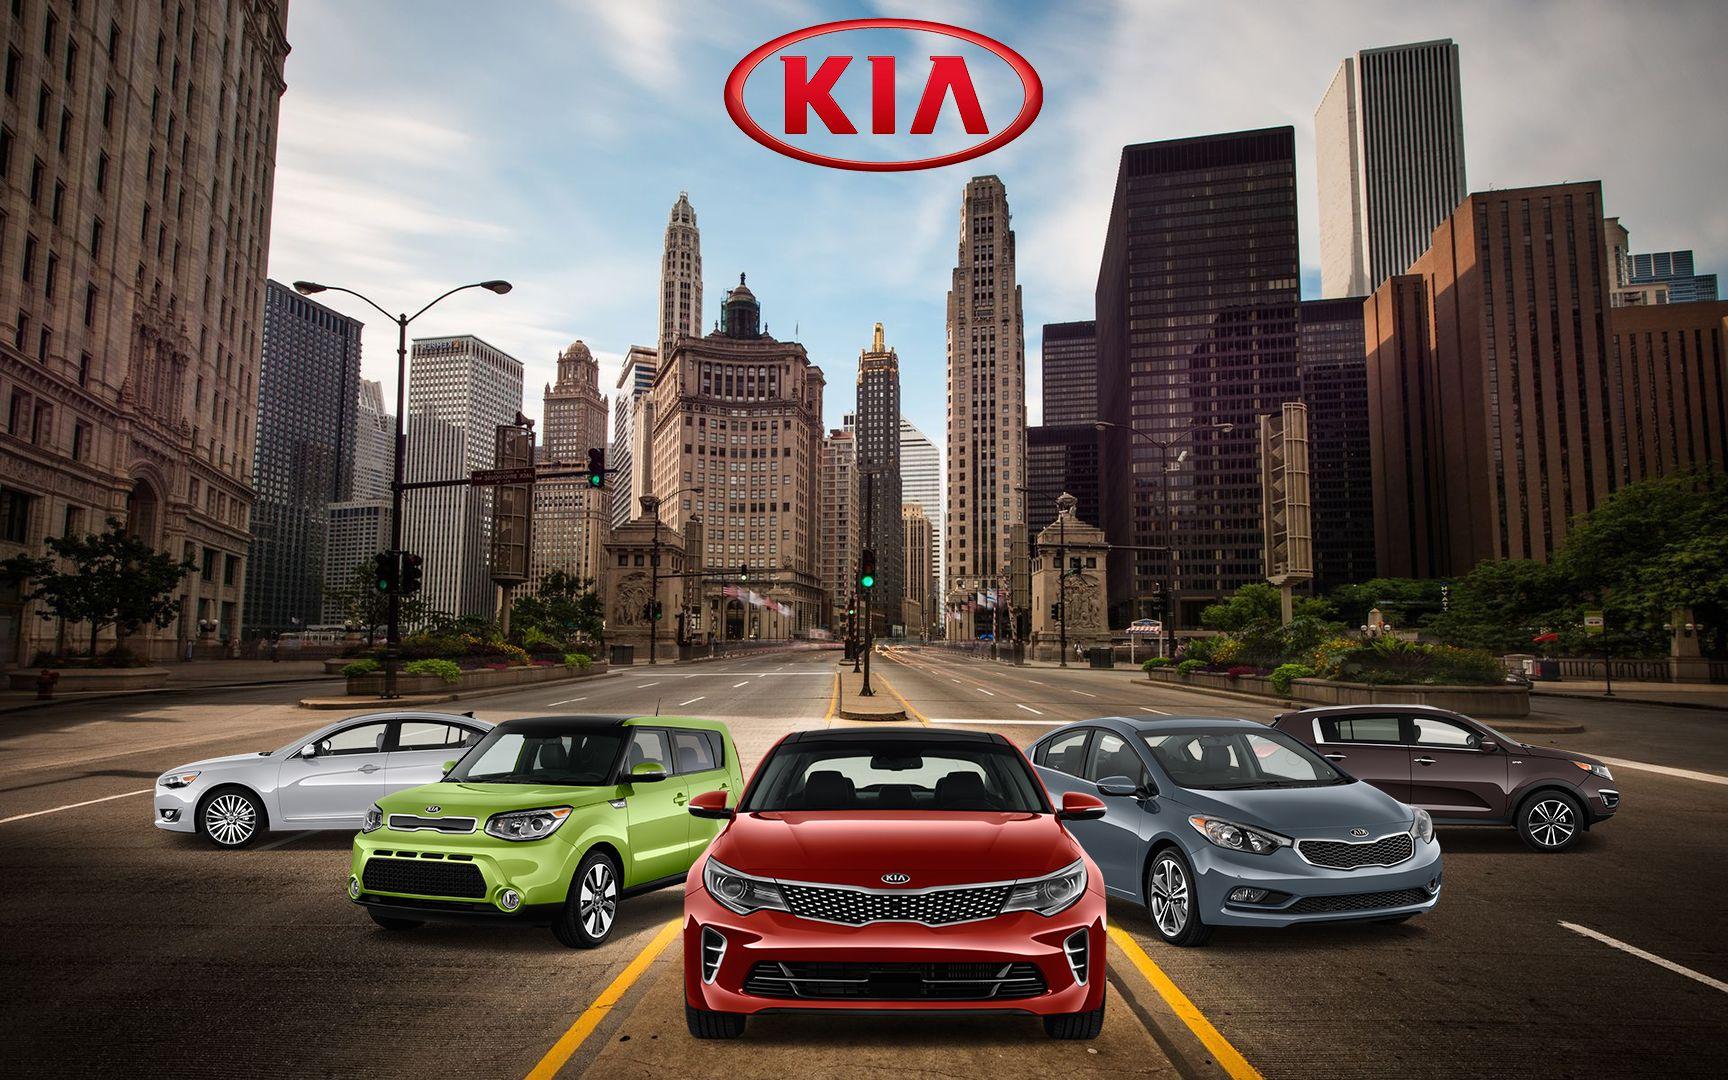 Kia Motor Corporation Headquartered In Seoul Is South Korea S Second Largest Automobile Manufacturer Following The Hyundai Kia Motors Hyundai Motor Hyundai